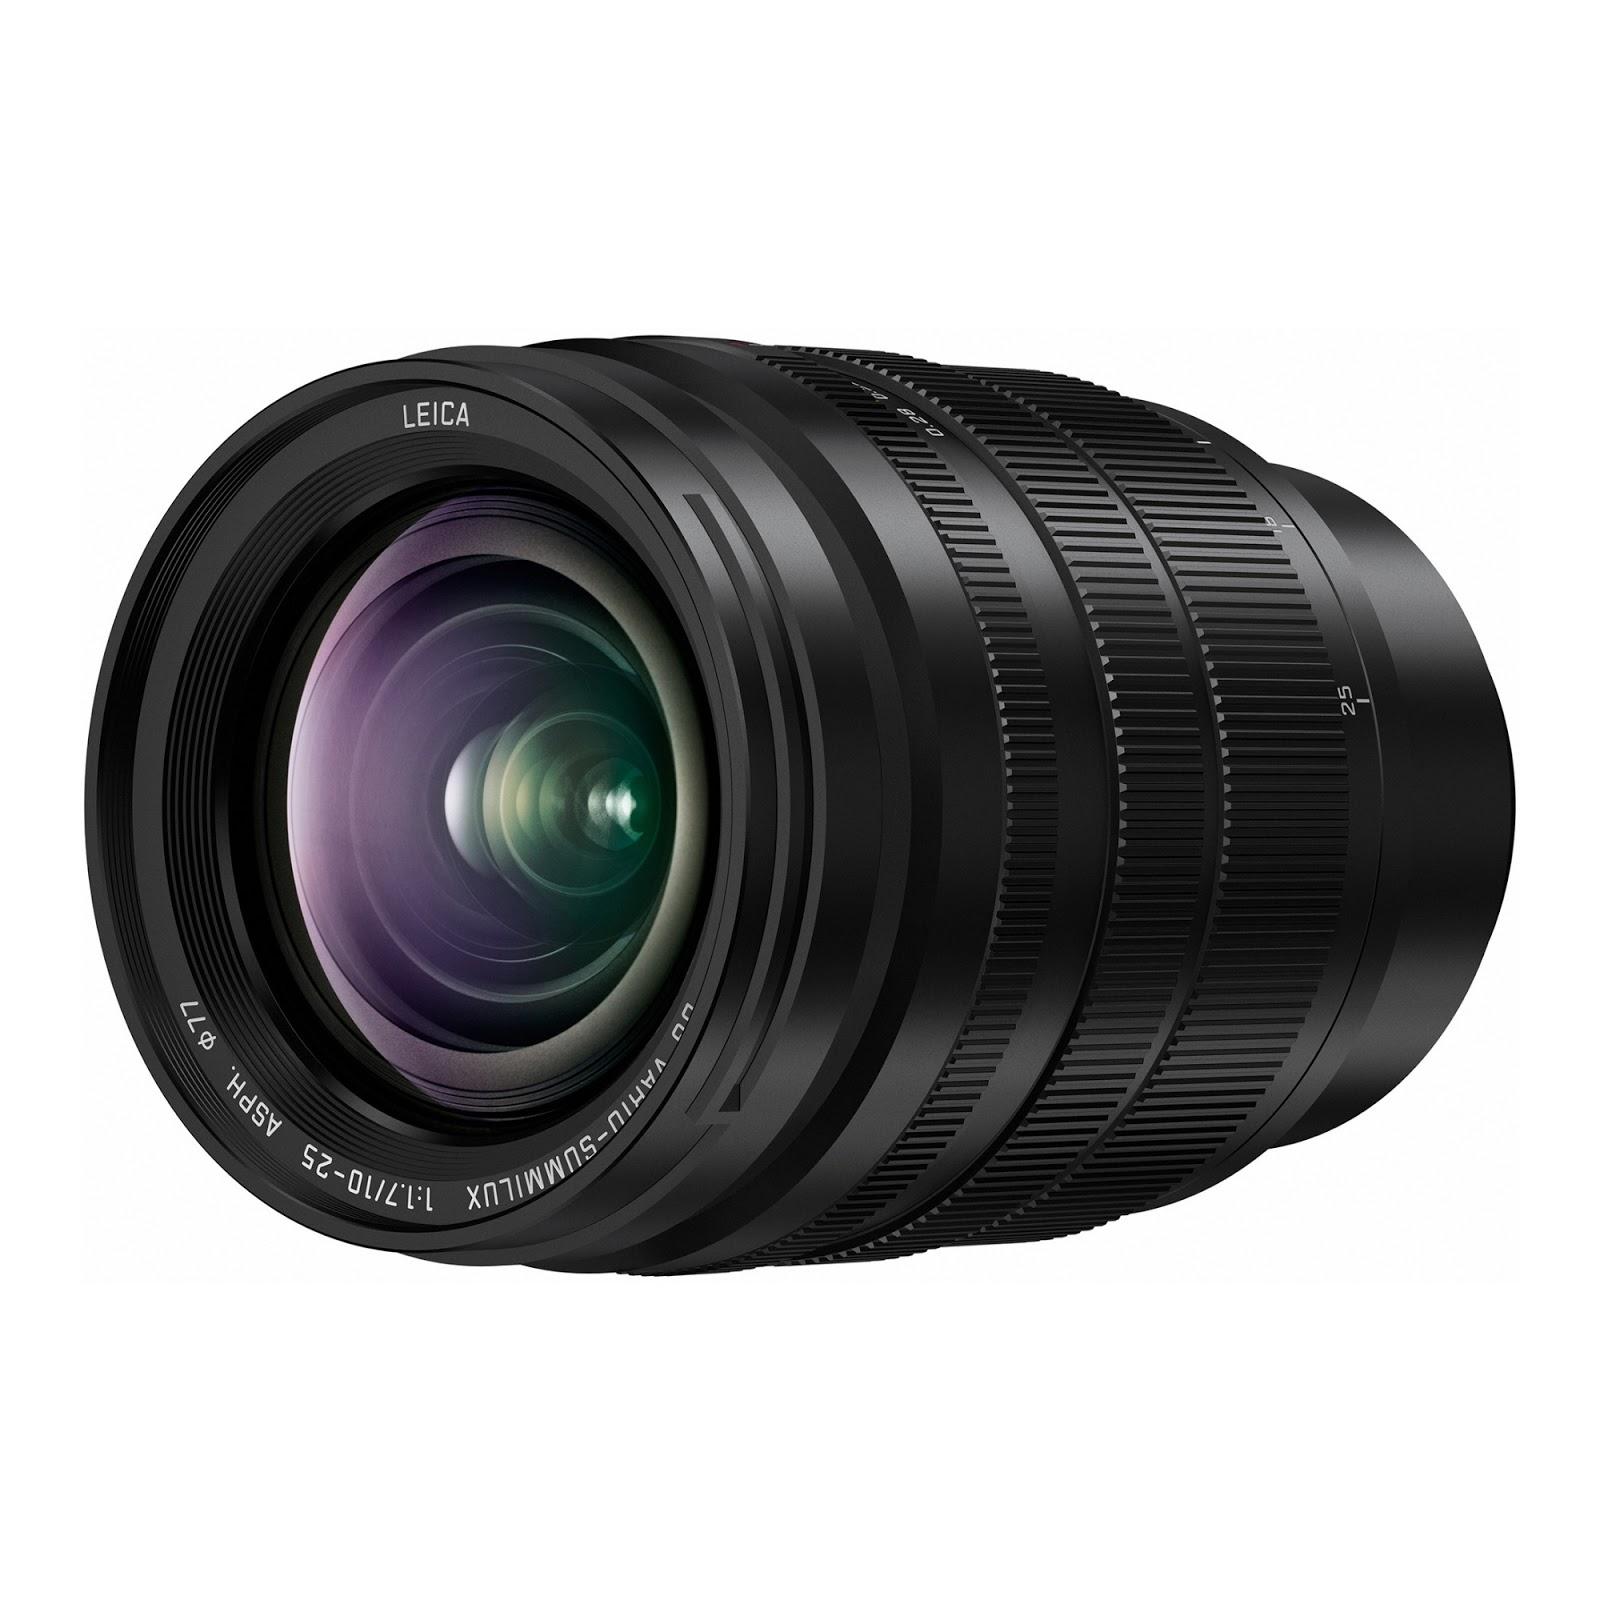 Panasonic Leica 10-25mm f/1.7 ASPH MFT Lens Officially Announced